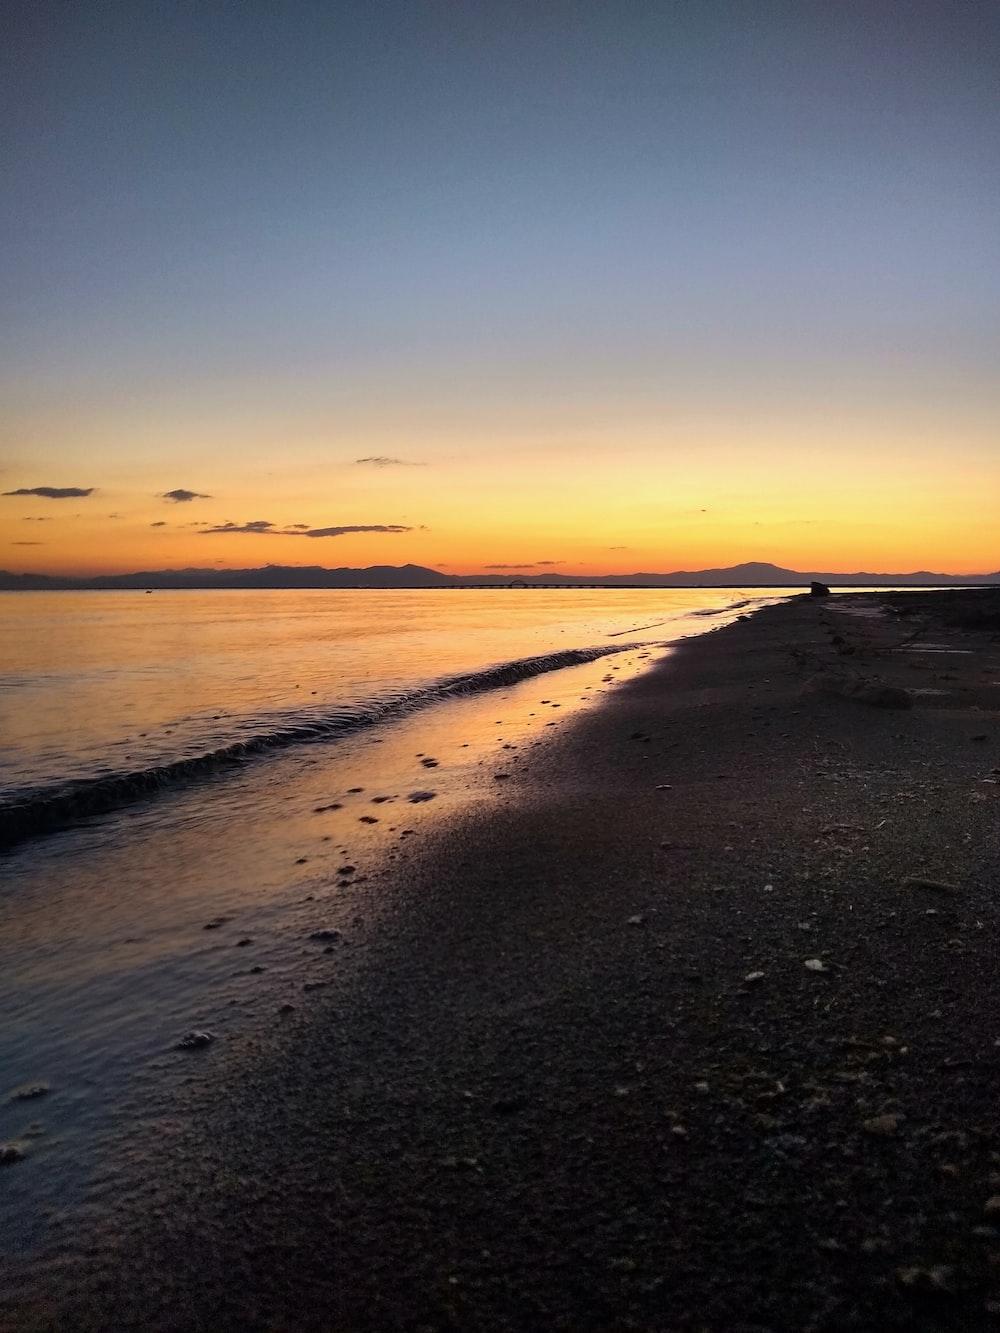 black sand at the beach